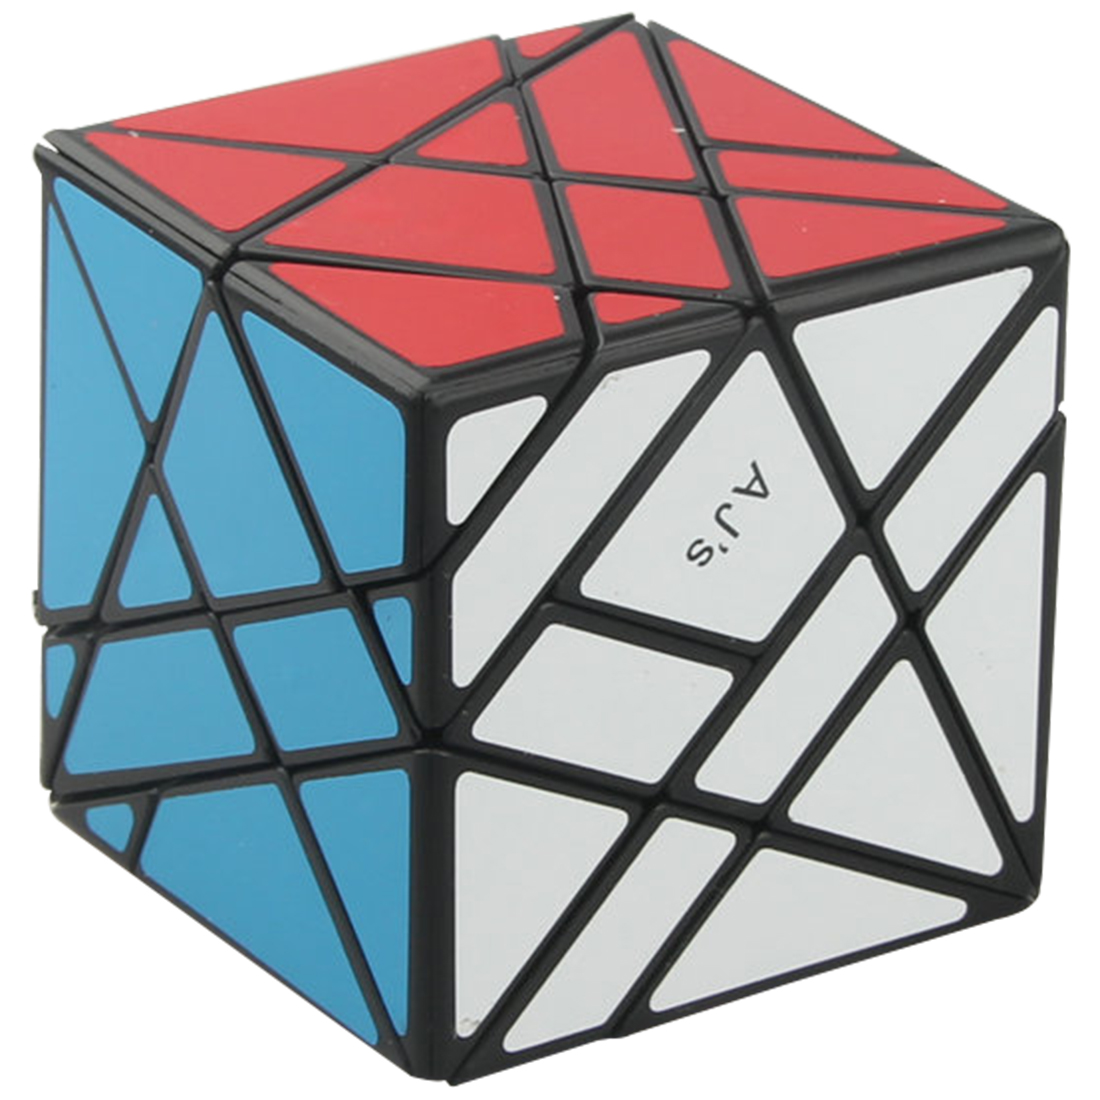 MF8 AJ Duo оси Cube Скорость Magic Cube Puzzle игрушки-красочные